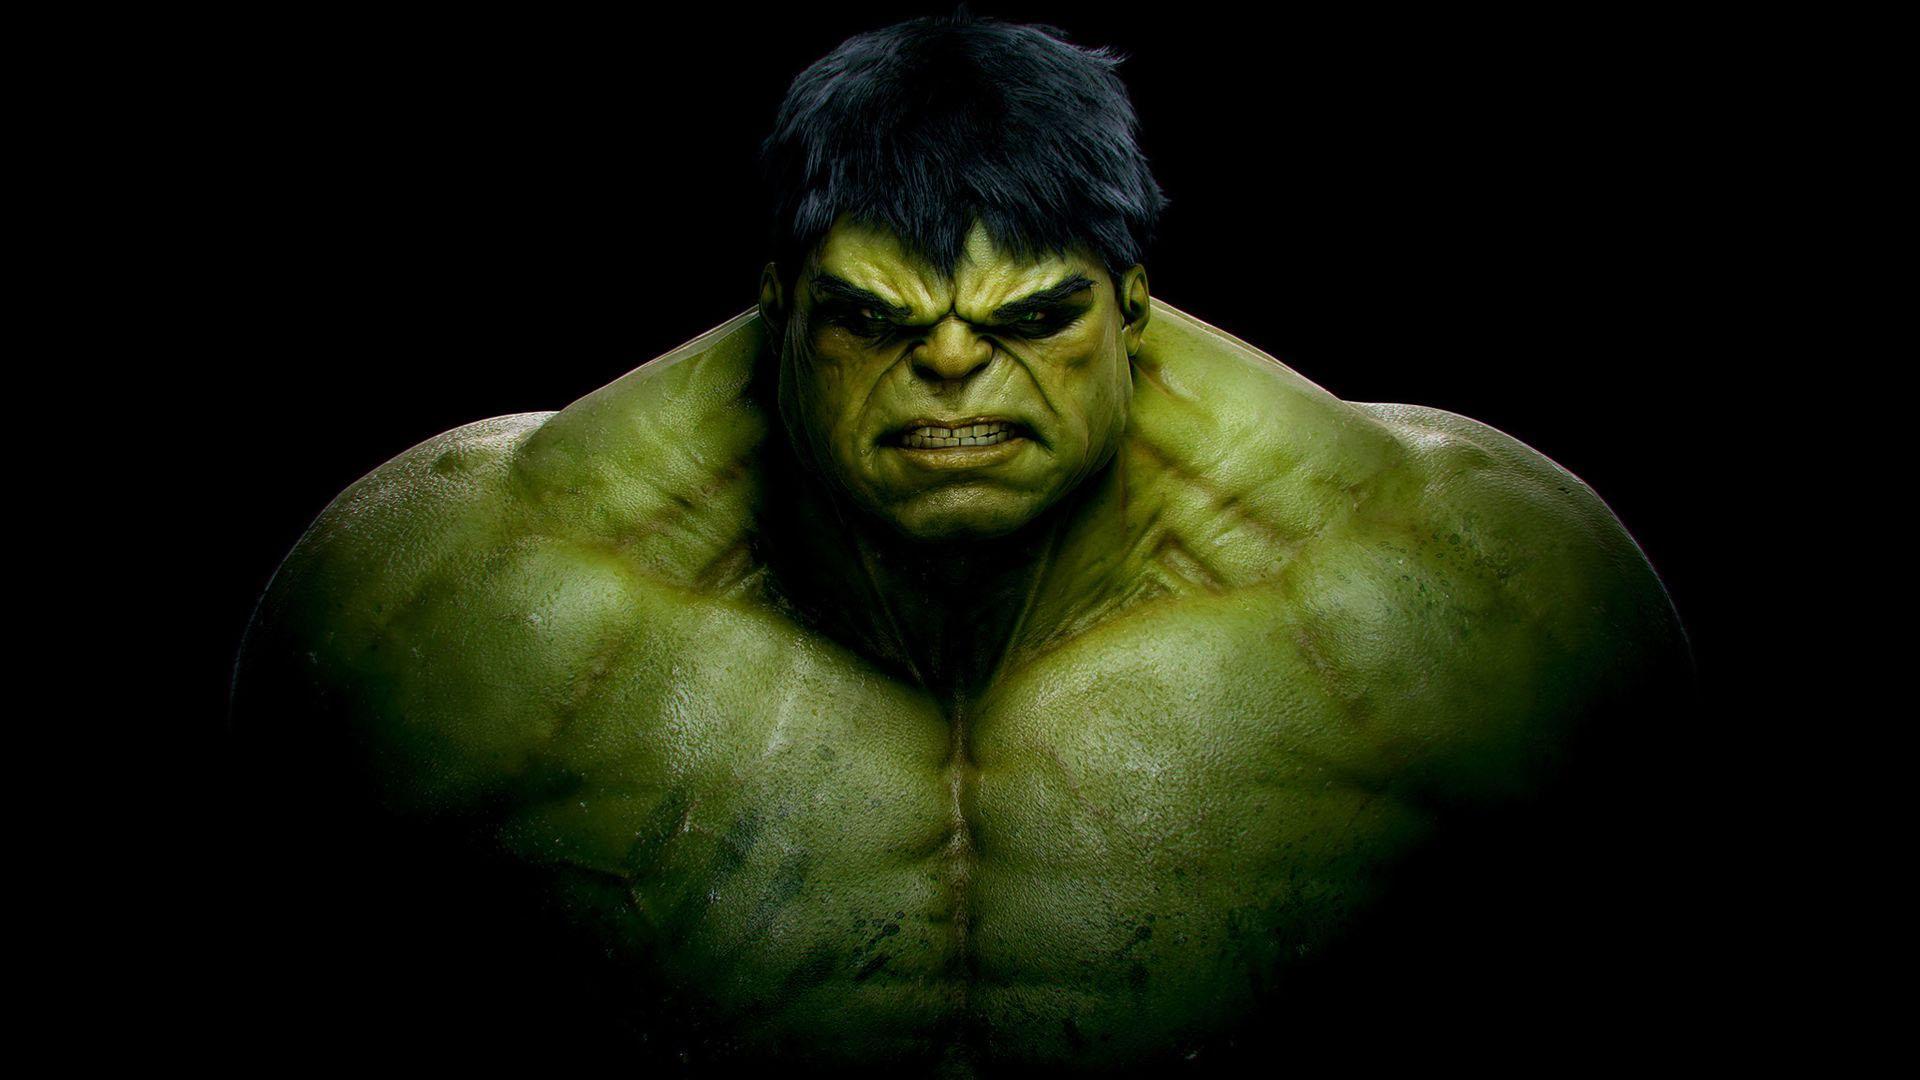 the incredible hulk wallpaper hd